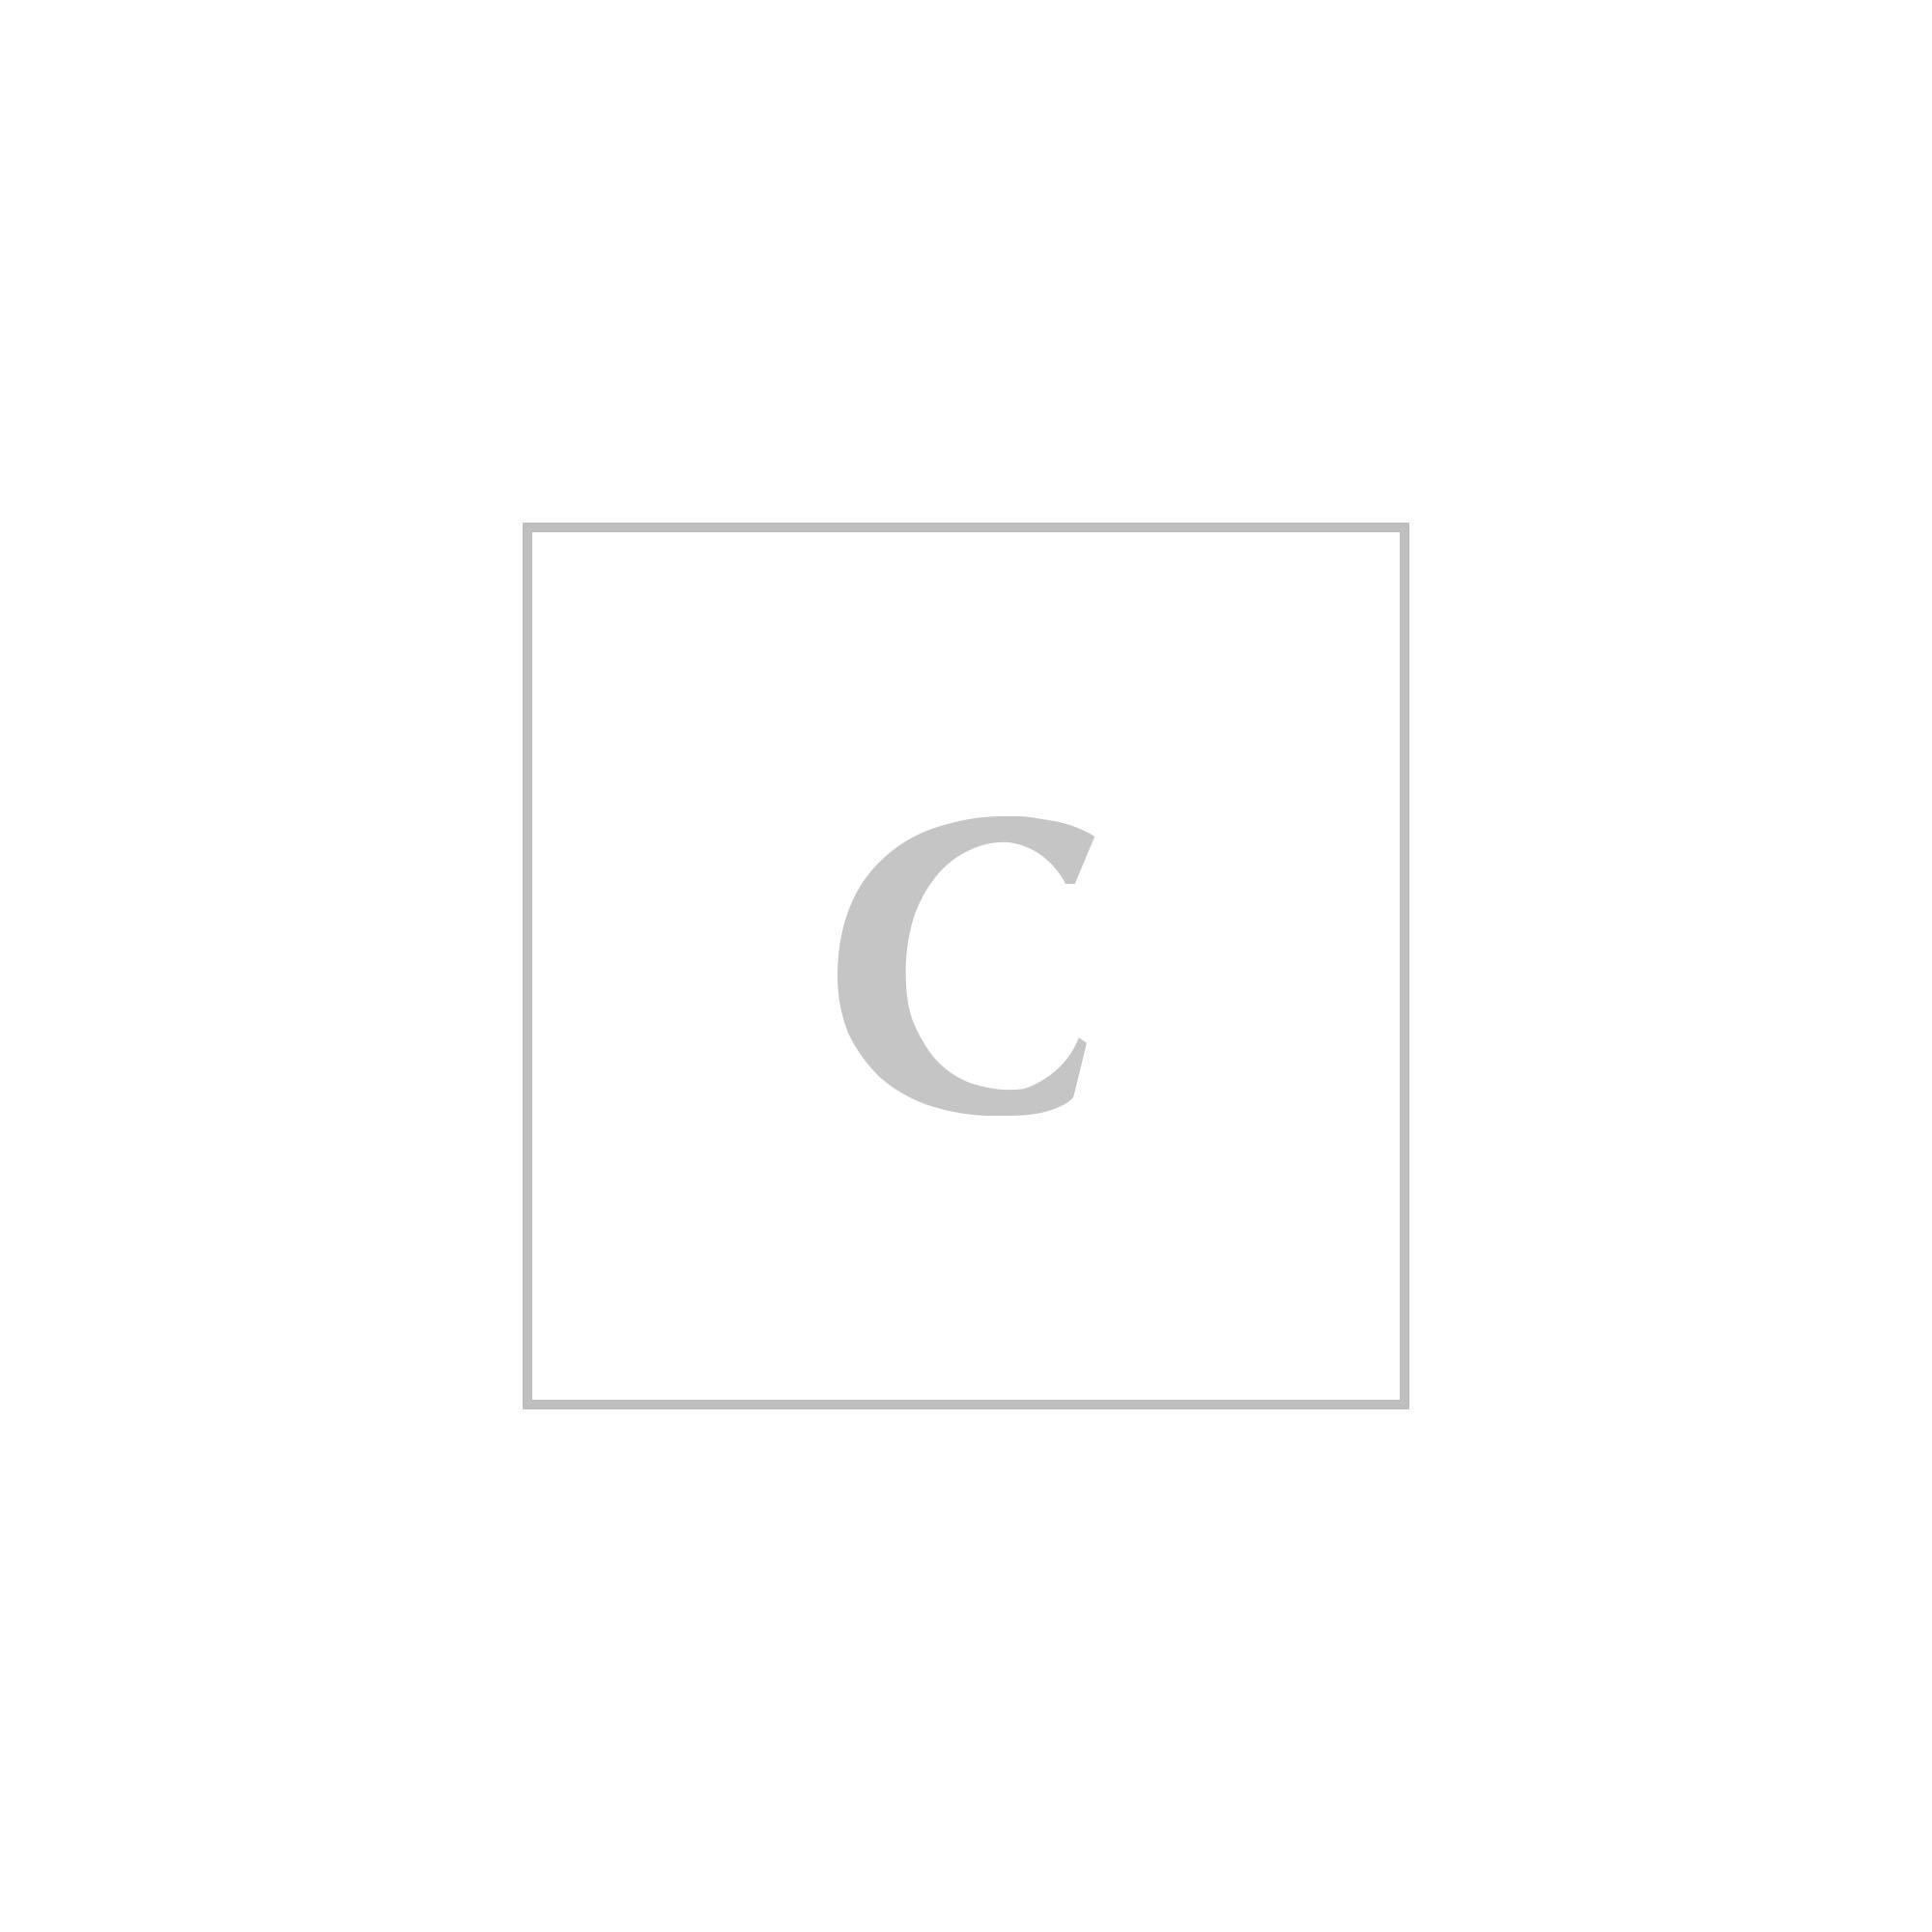 Stella mccartney small plexi falabella with logo